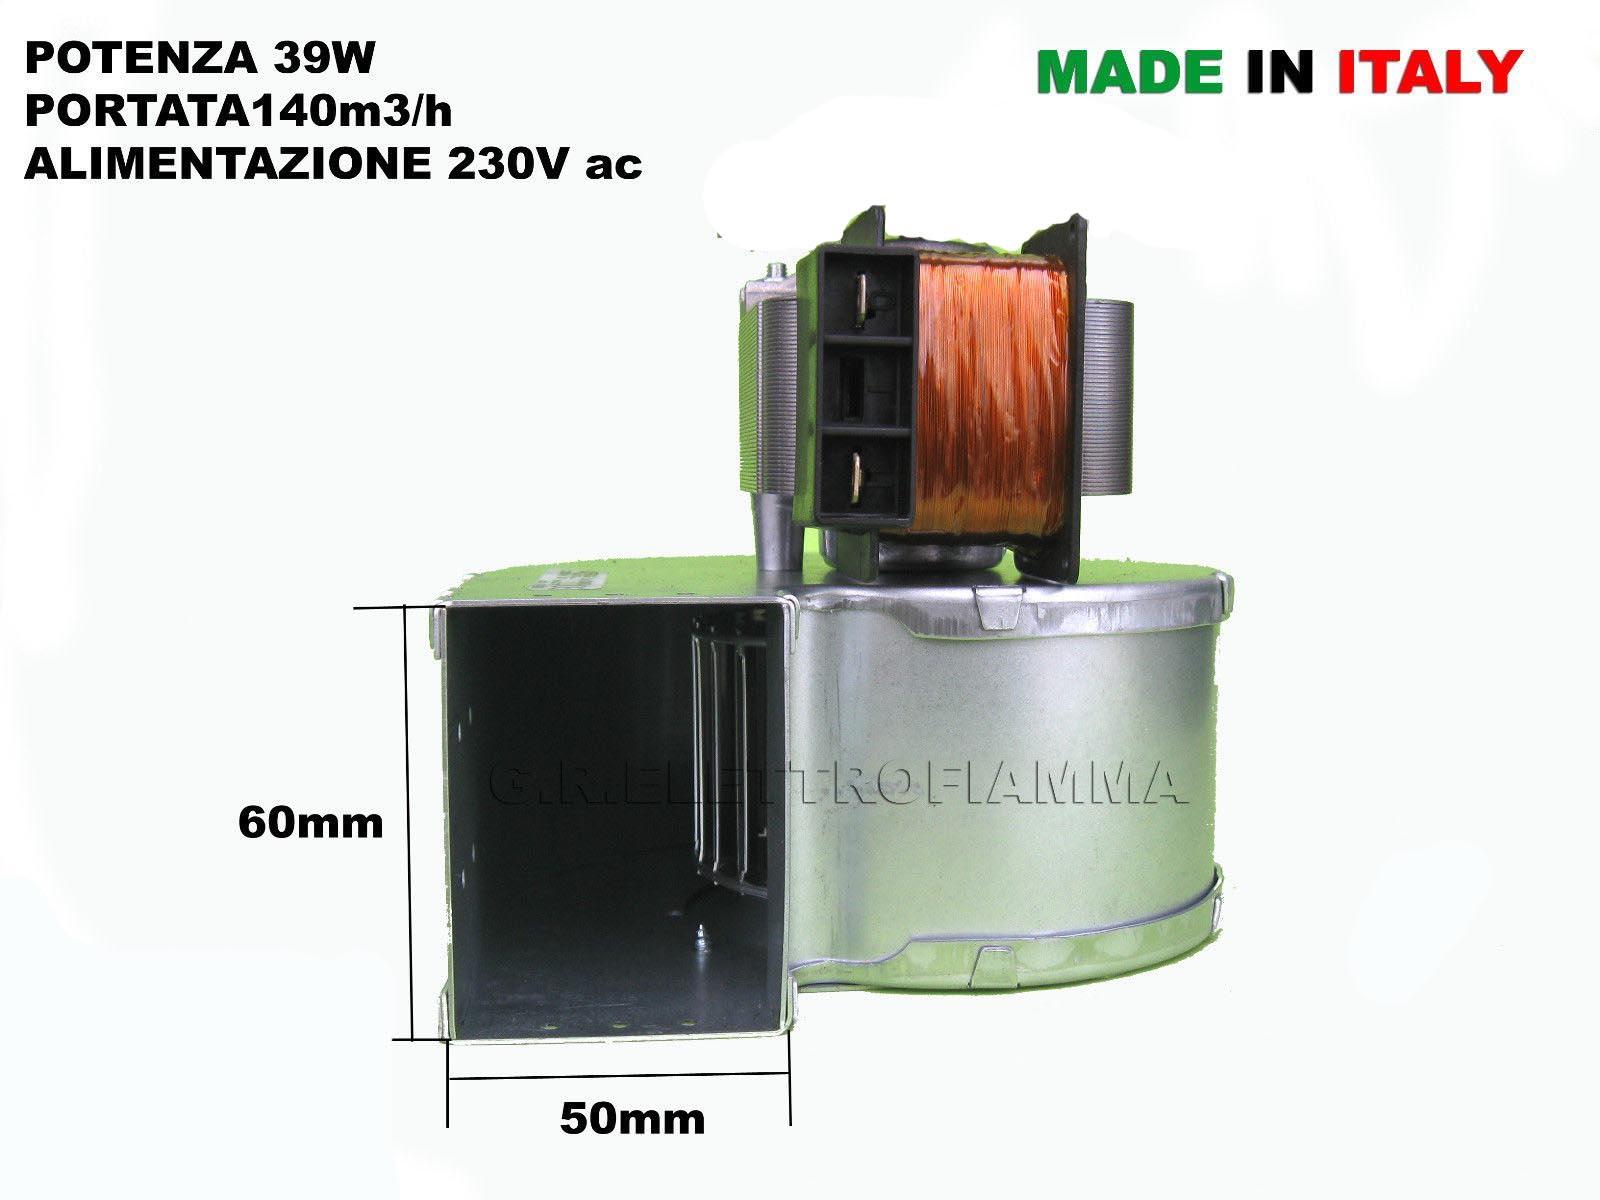 Tubi Aria Calda Stufa Pellet ventola emmevi cod.204853 ventilatore centrifugo aria calda per stufe a  pellet distridutore automatico motore sx 39w